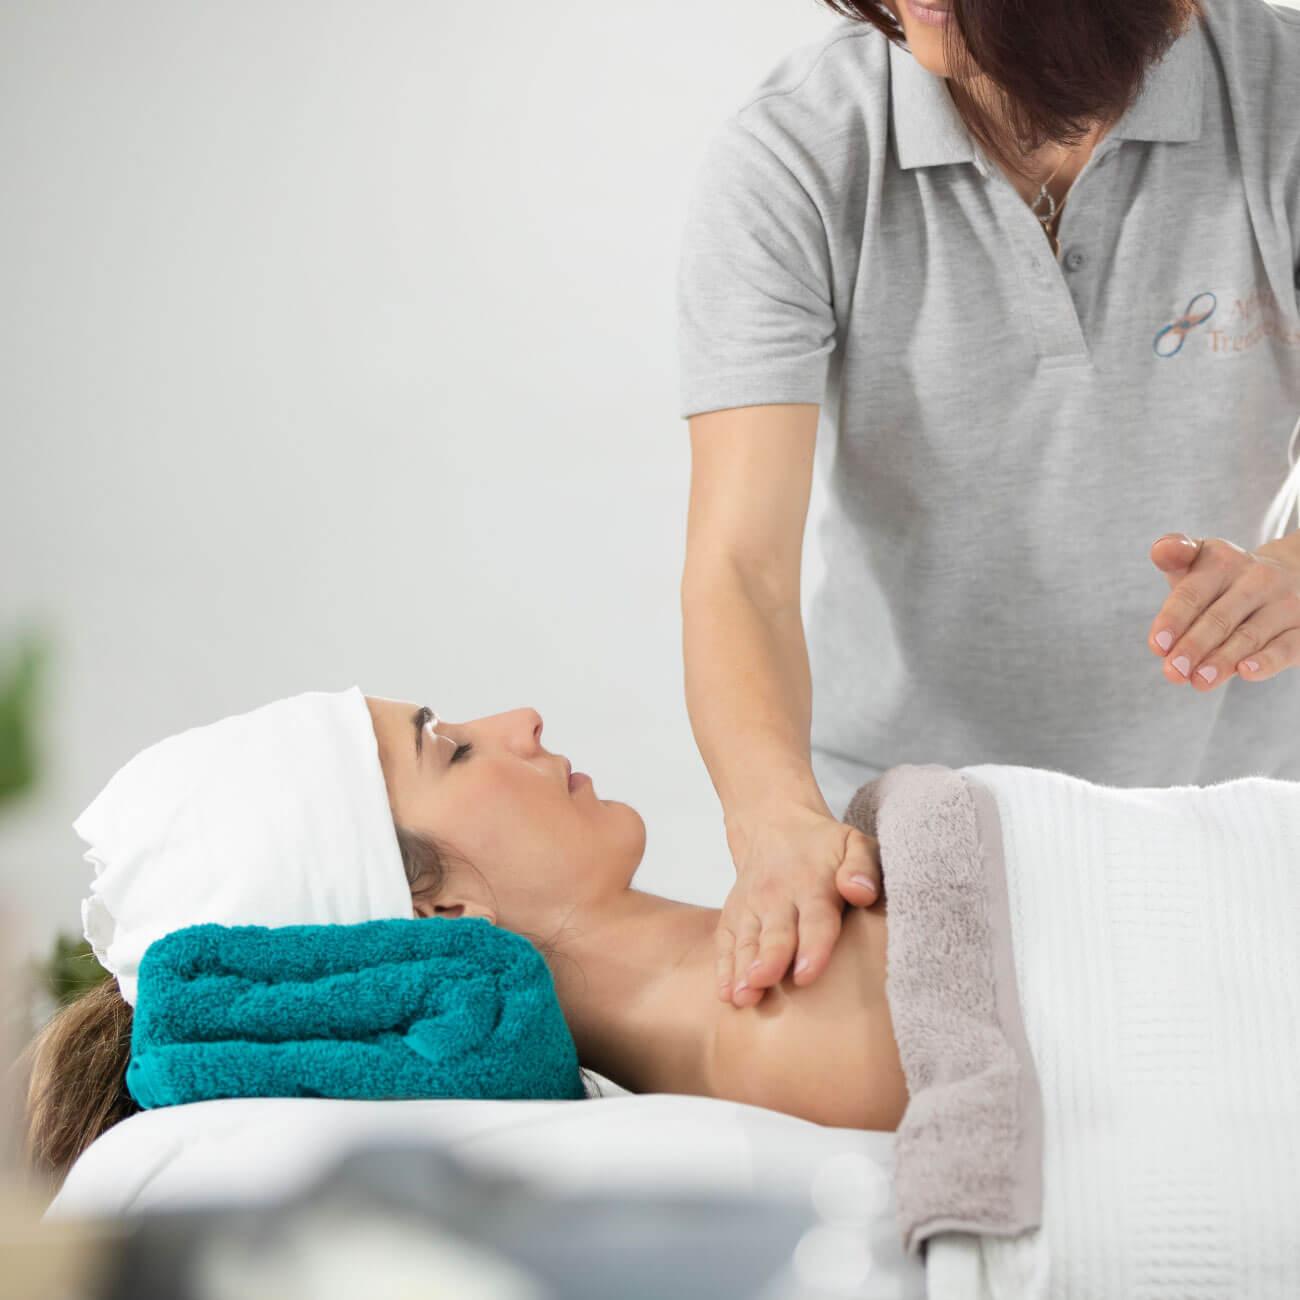 Affinity Treatment pregnancy massage